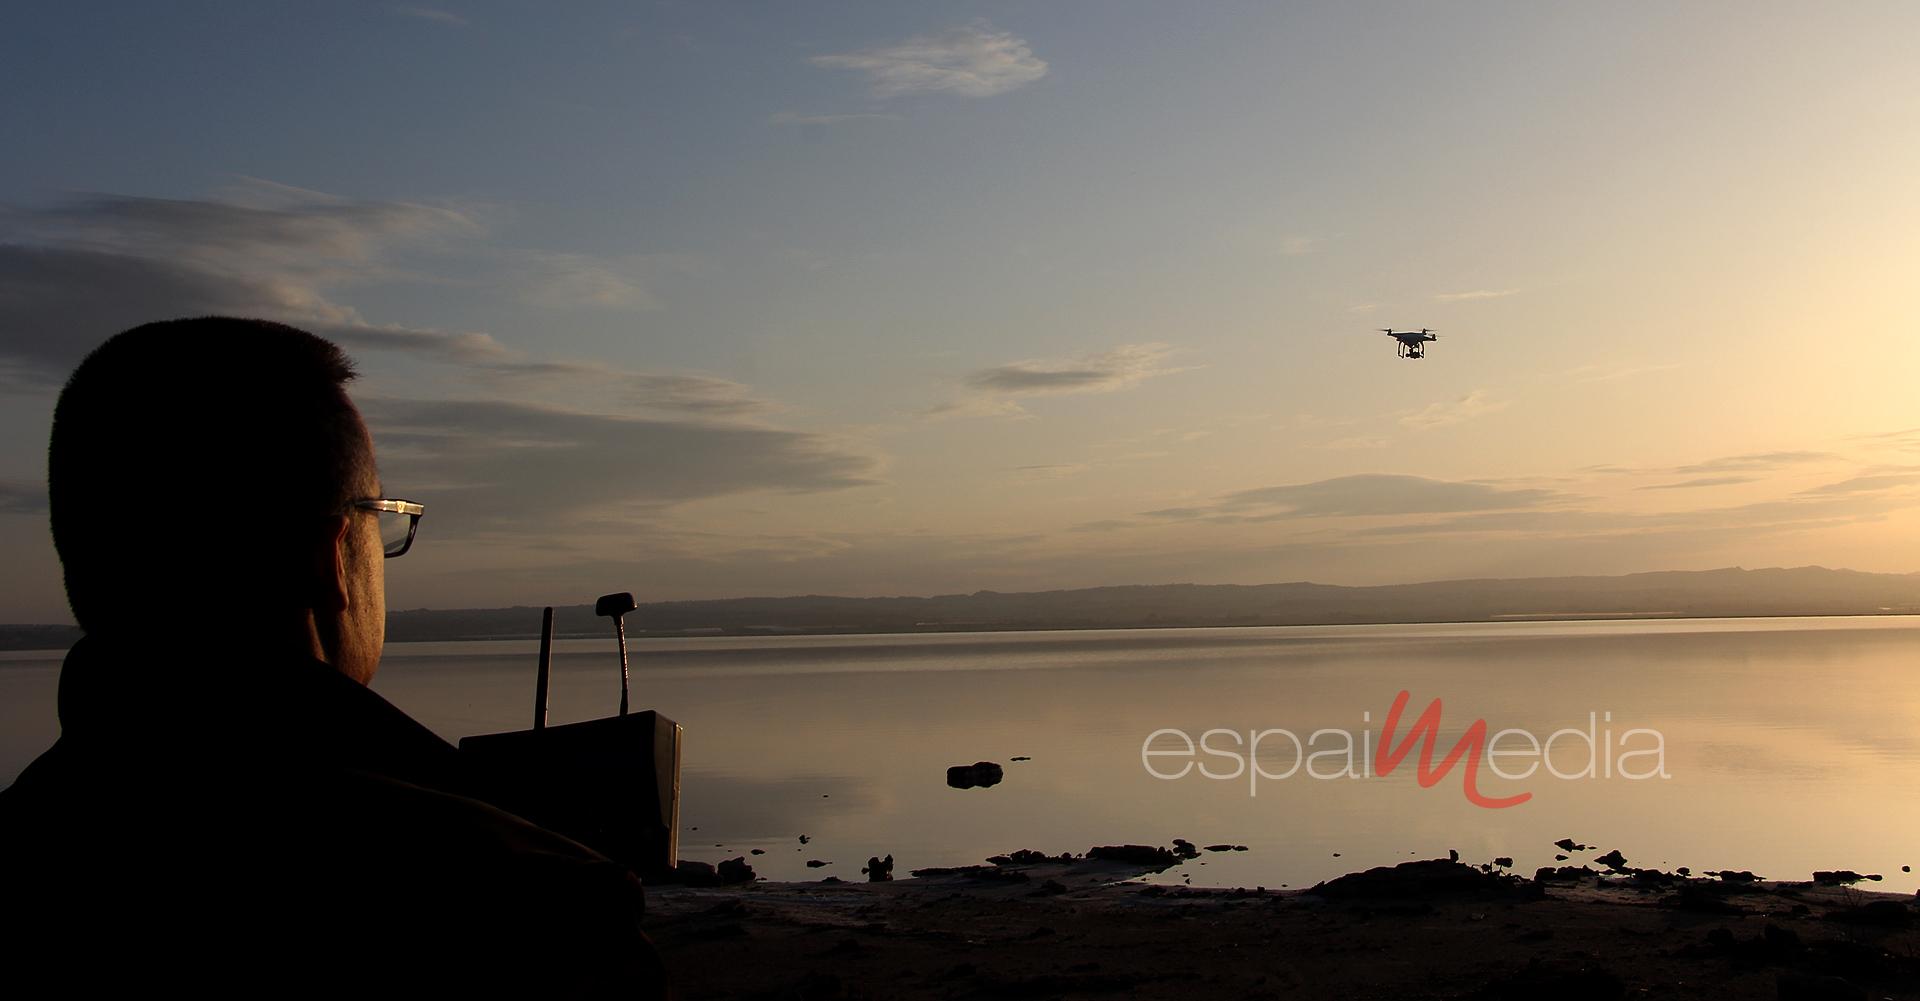 drone-del-lago-espaimedia